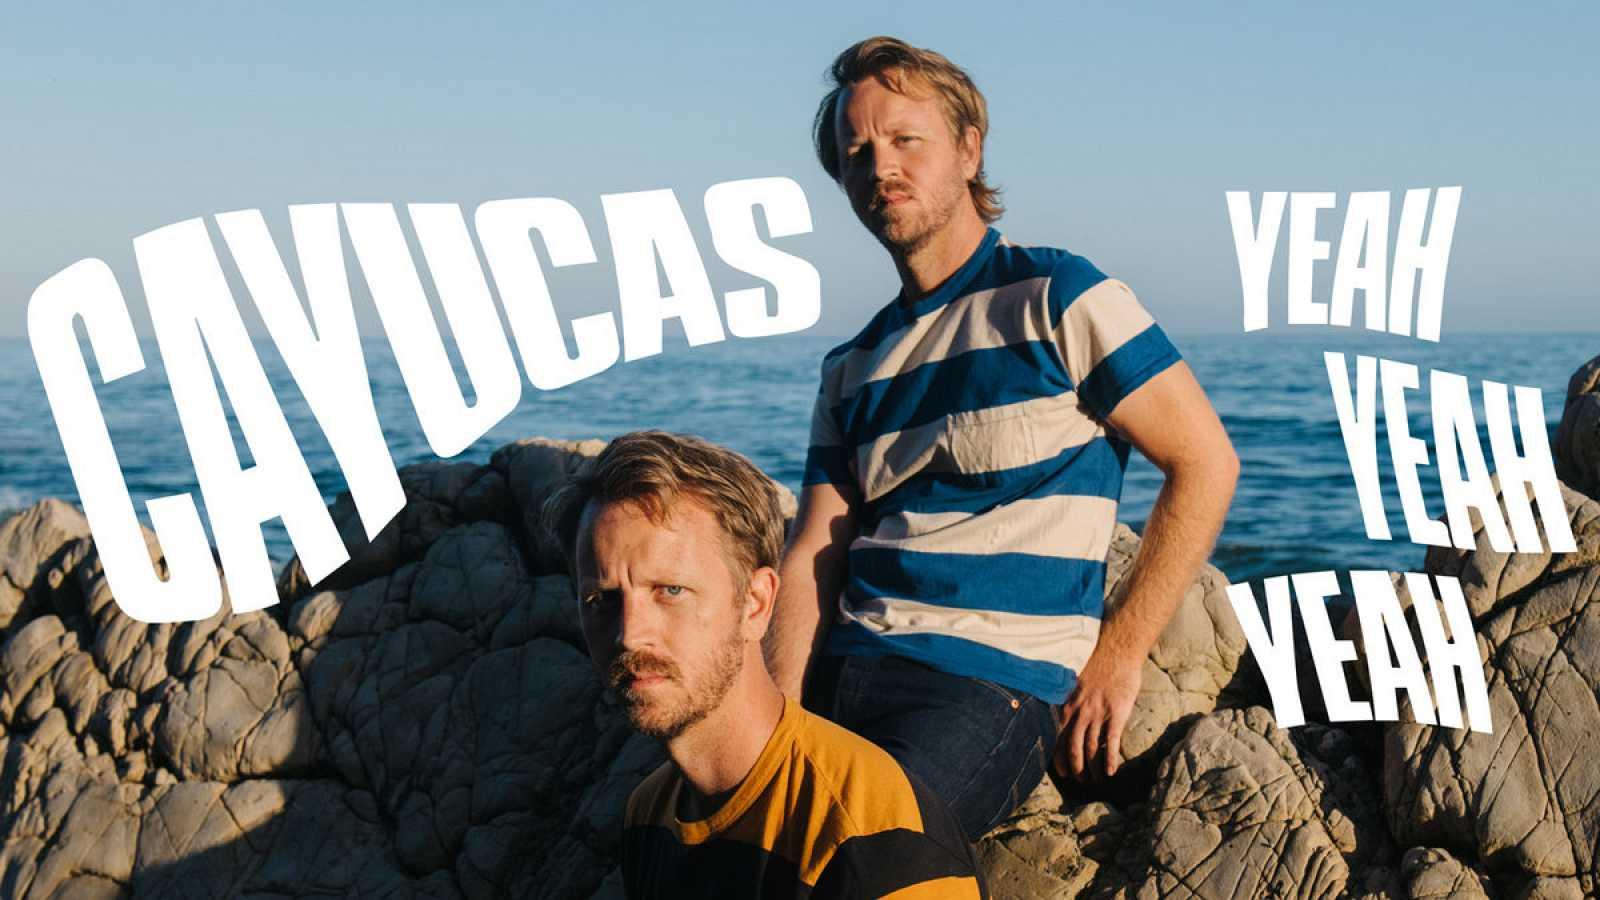 Na Na Na - Cayucas y Beck - 19/08/20 - escuchar ahora